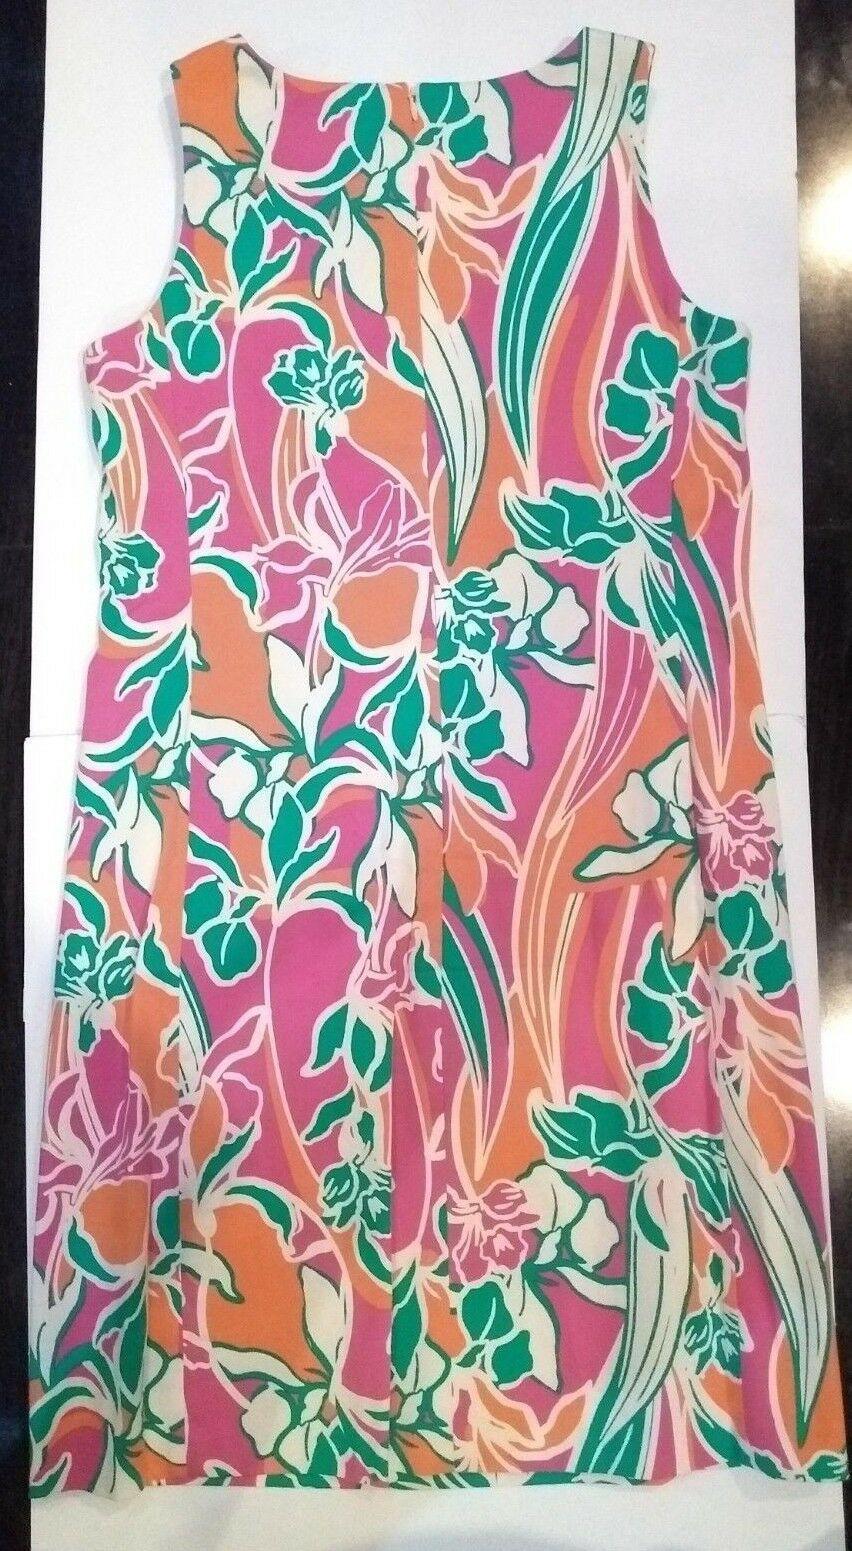 Anne Klein Pink Coral Sleeveless Keyhole Collar Pocket Dress Size 6 Retail $119